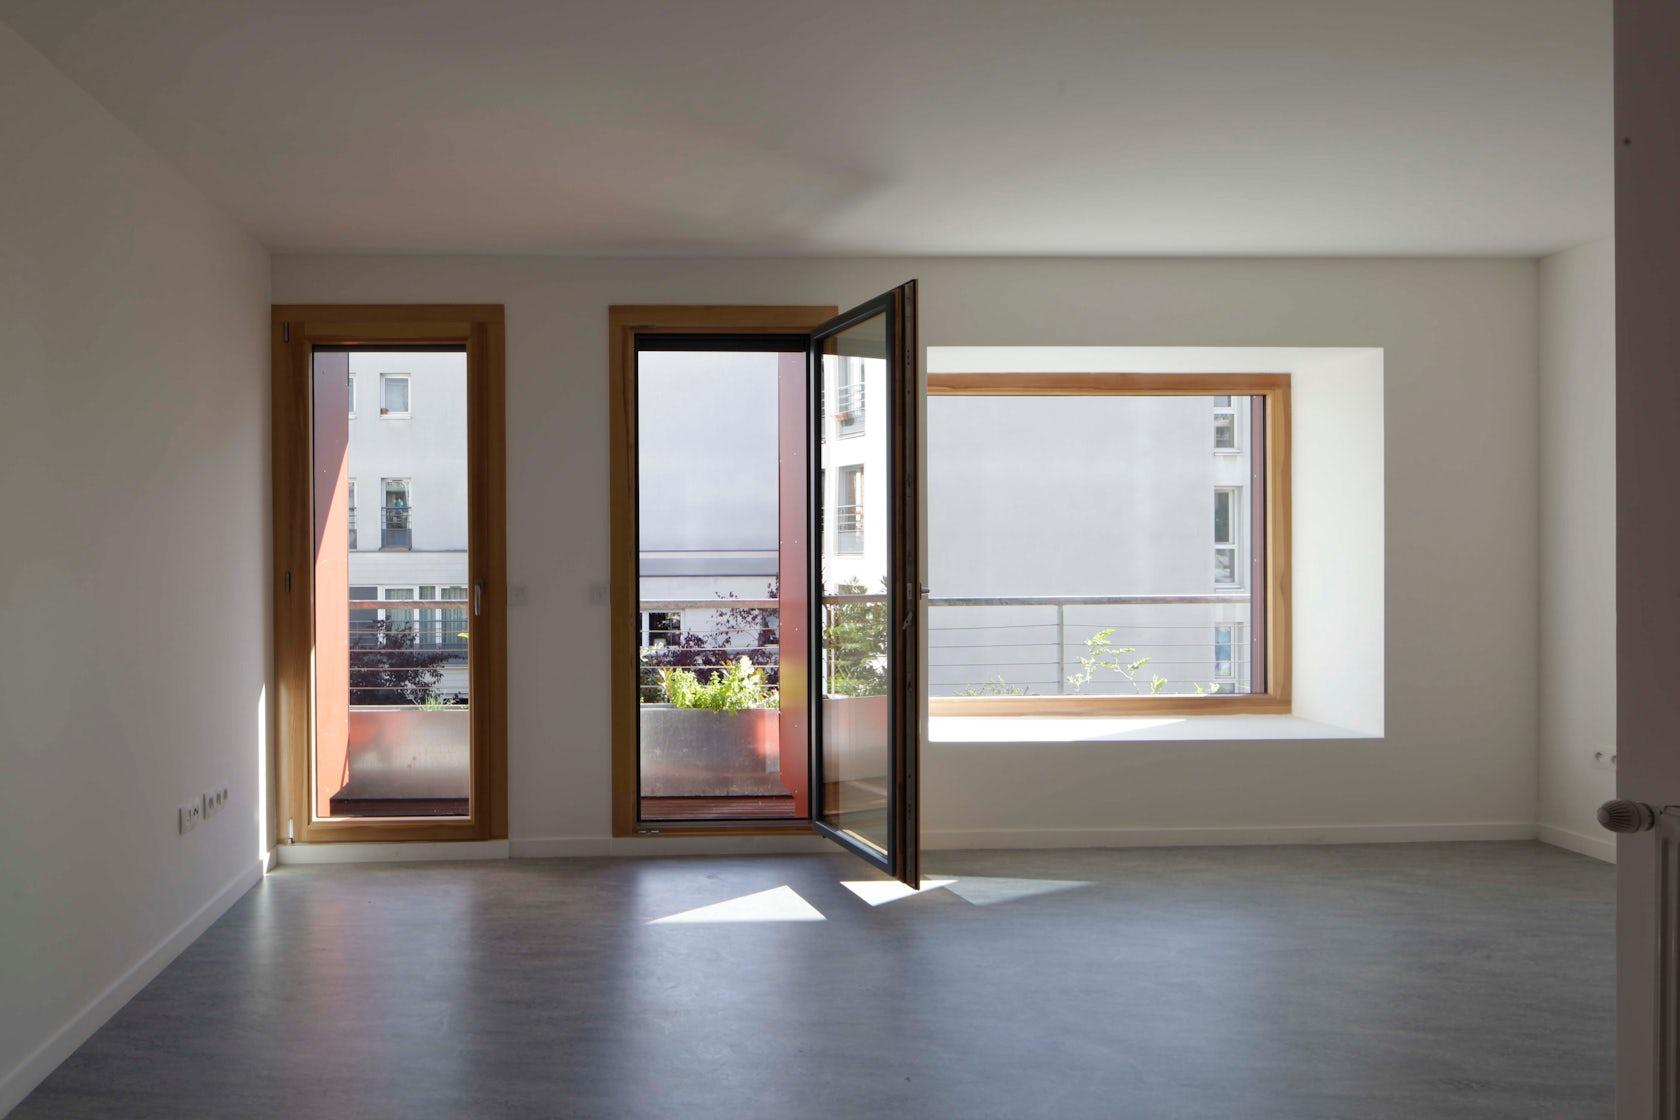 b ton de chanvre architizer. Black Bedroom Furniture Sets. Home Design Ideas